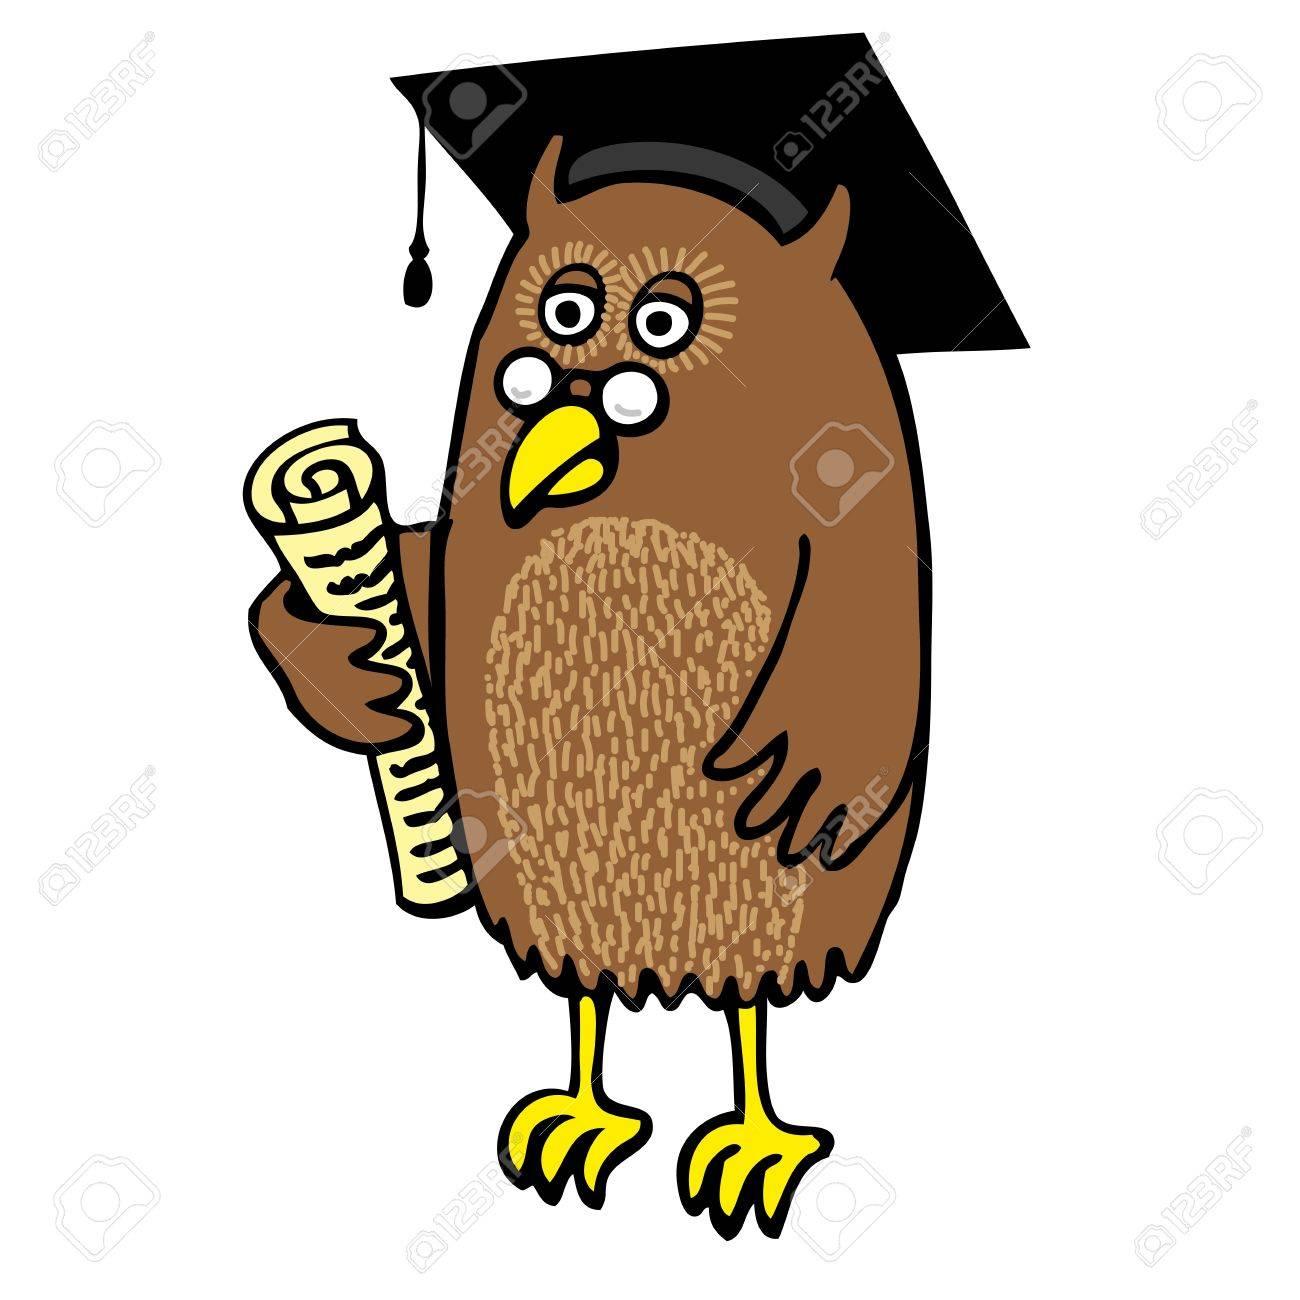 Graduation Owl Stock Vector - 12044173